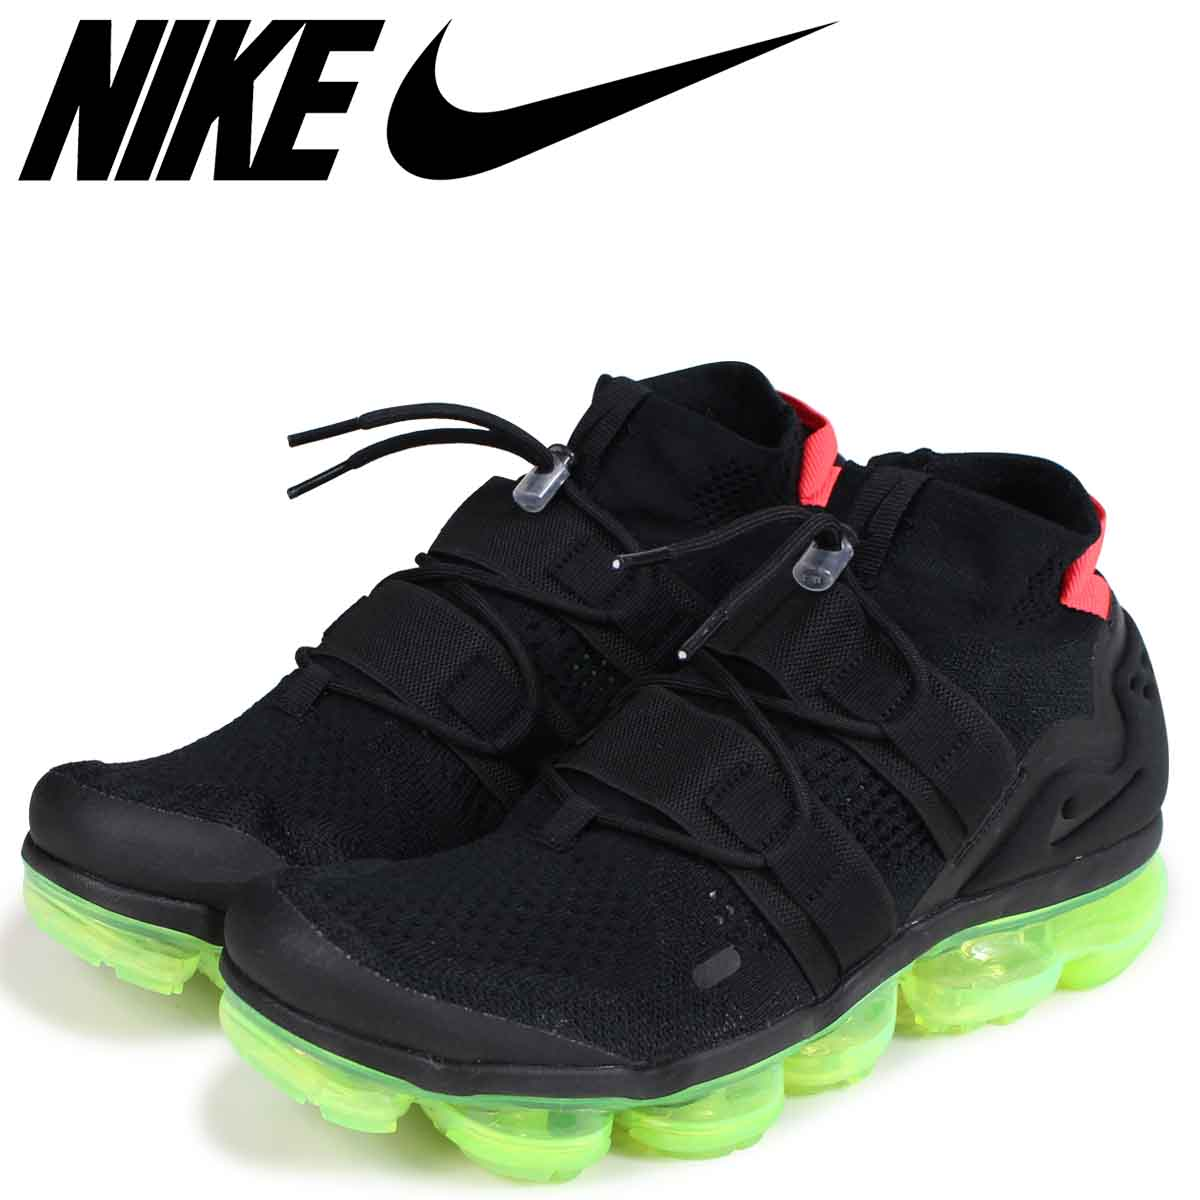 brand new d3a2b d5305 NIKE Nike air vapor max fried food knit sneakers men AIR VAPORMAX FLYKNIT  UTILITY AH6834-007 black black